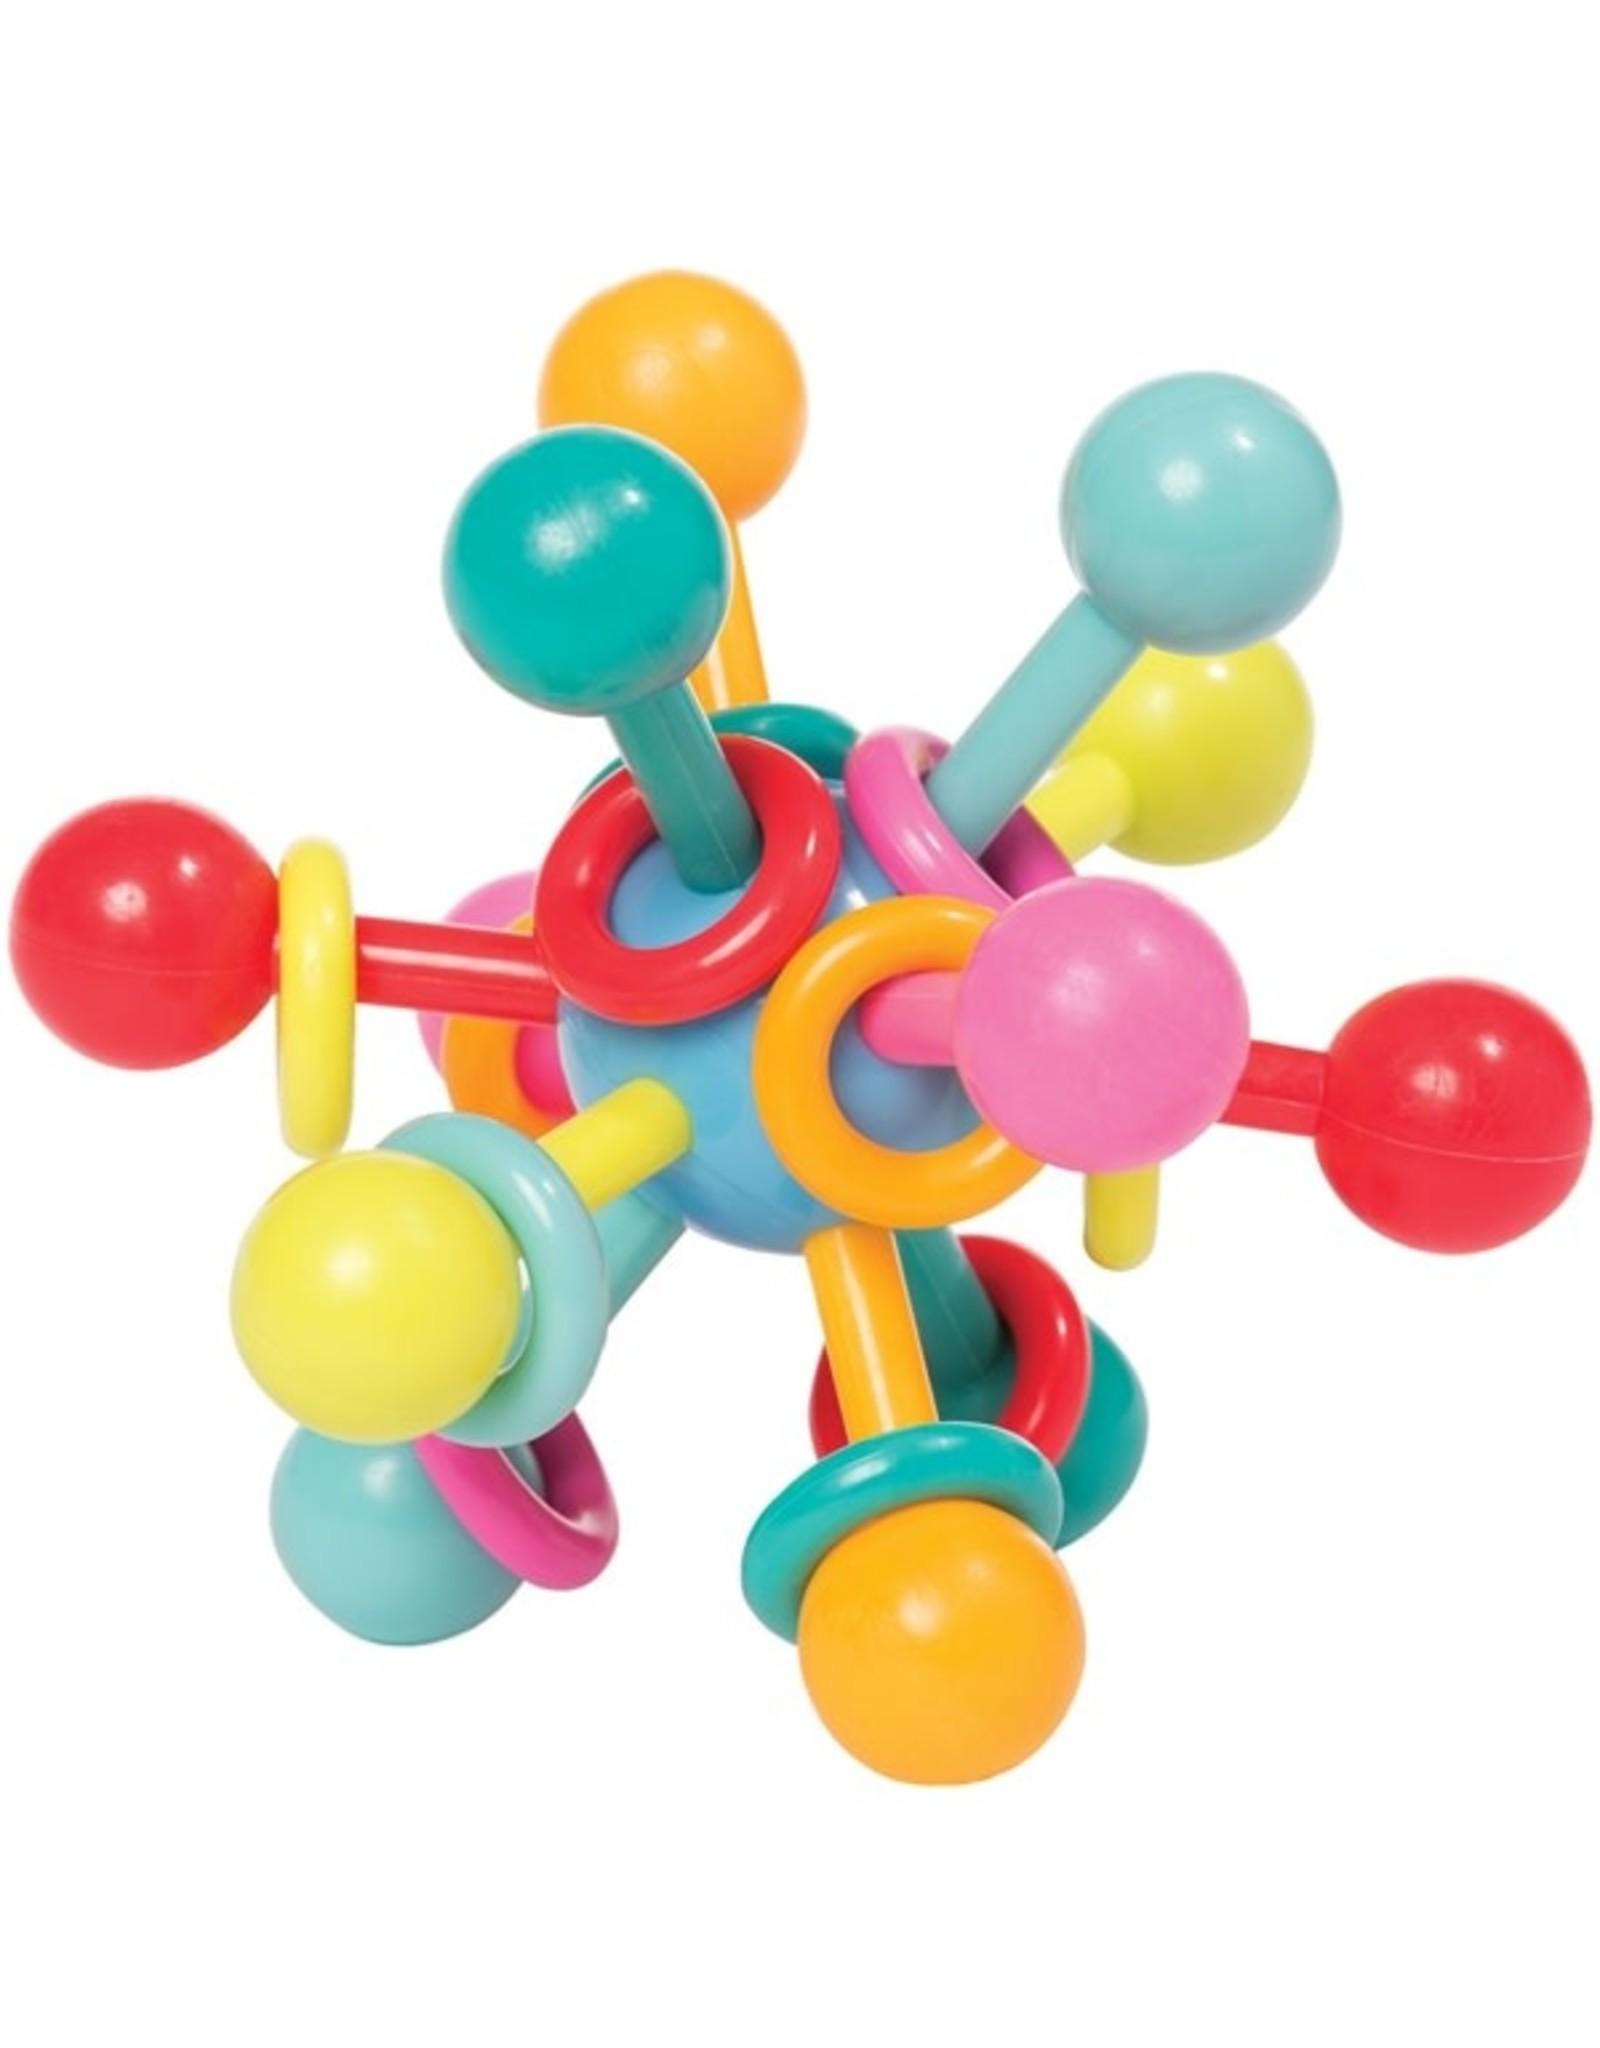 Manhattan Toy Atom Teether (Boxed)